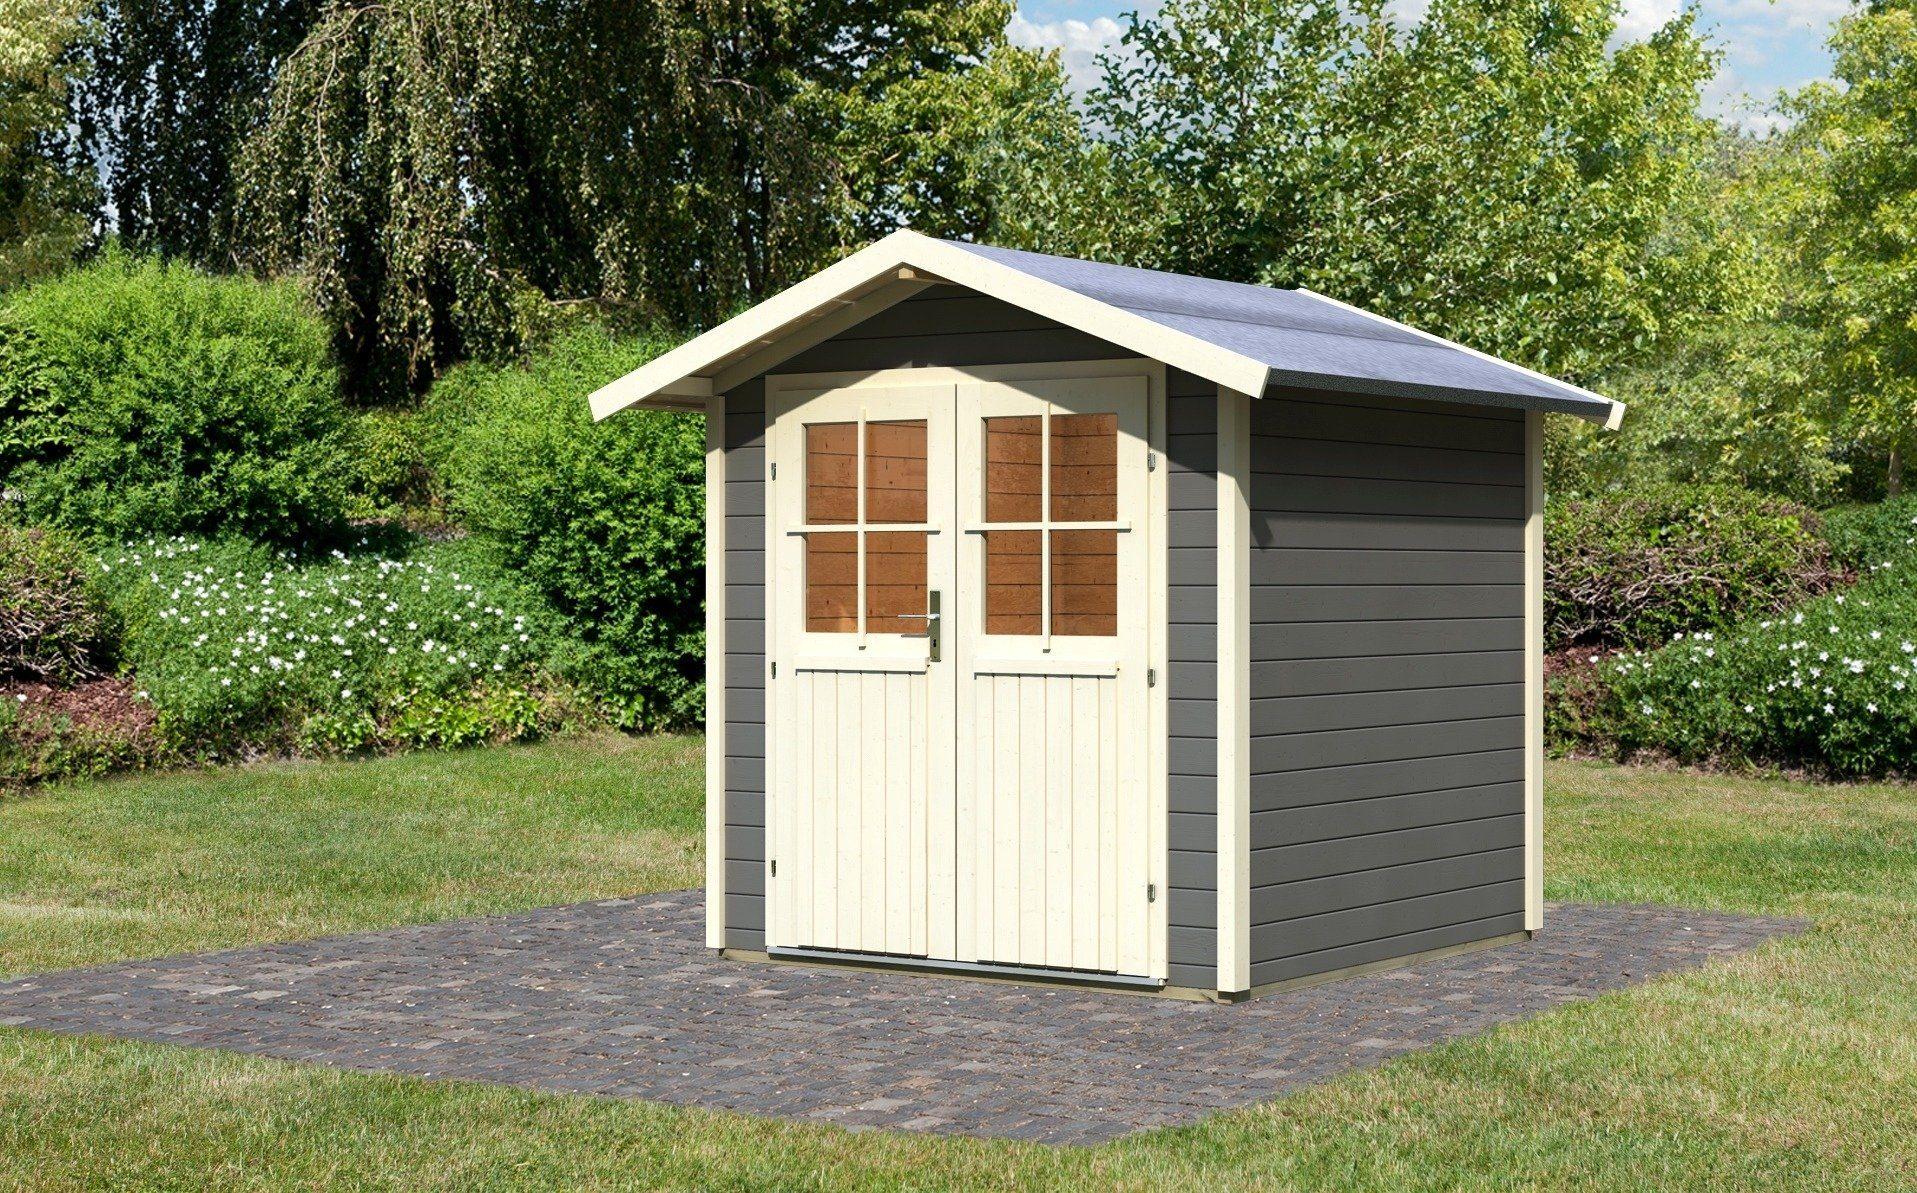 Karibu Gartenhaus »Smaland«, BxT: 200x200 cm